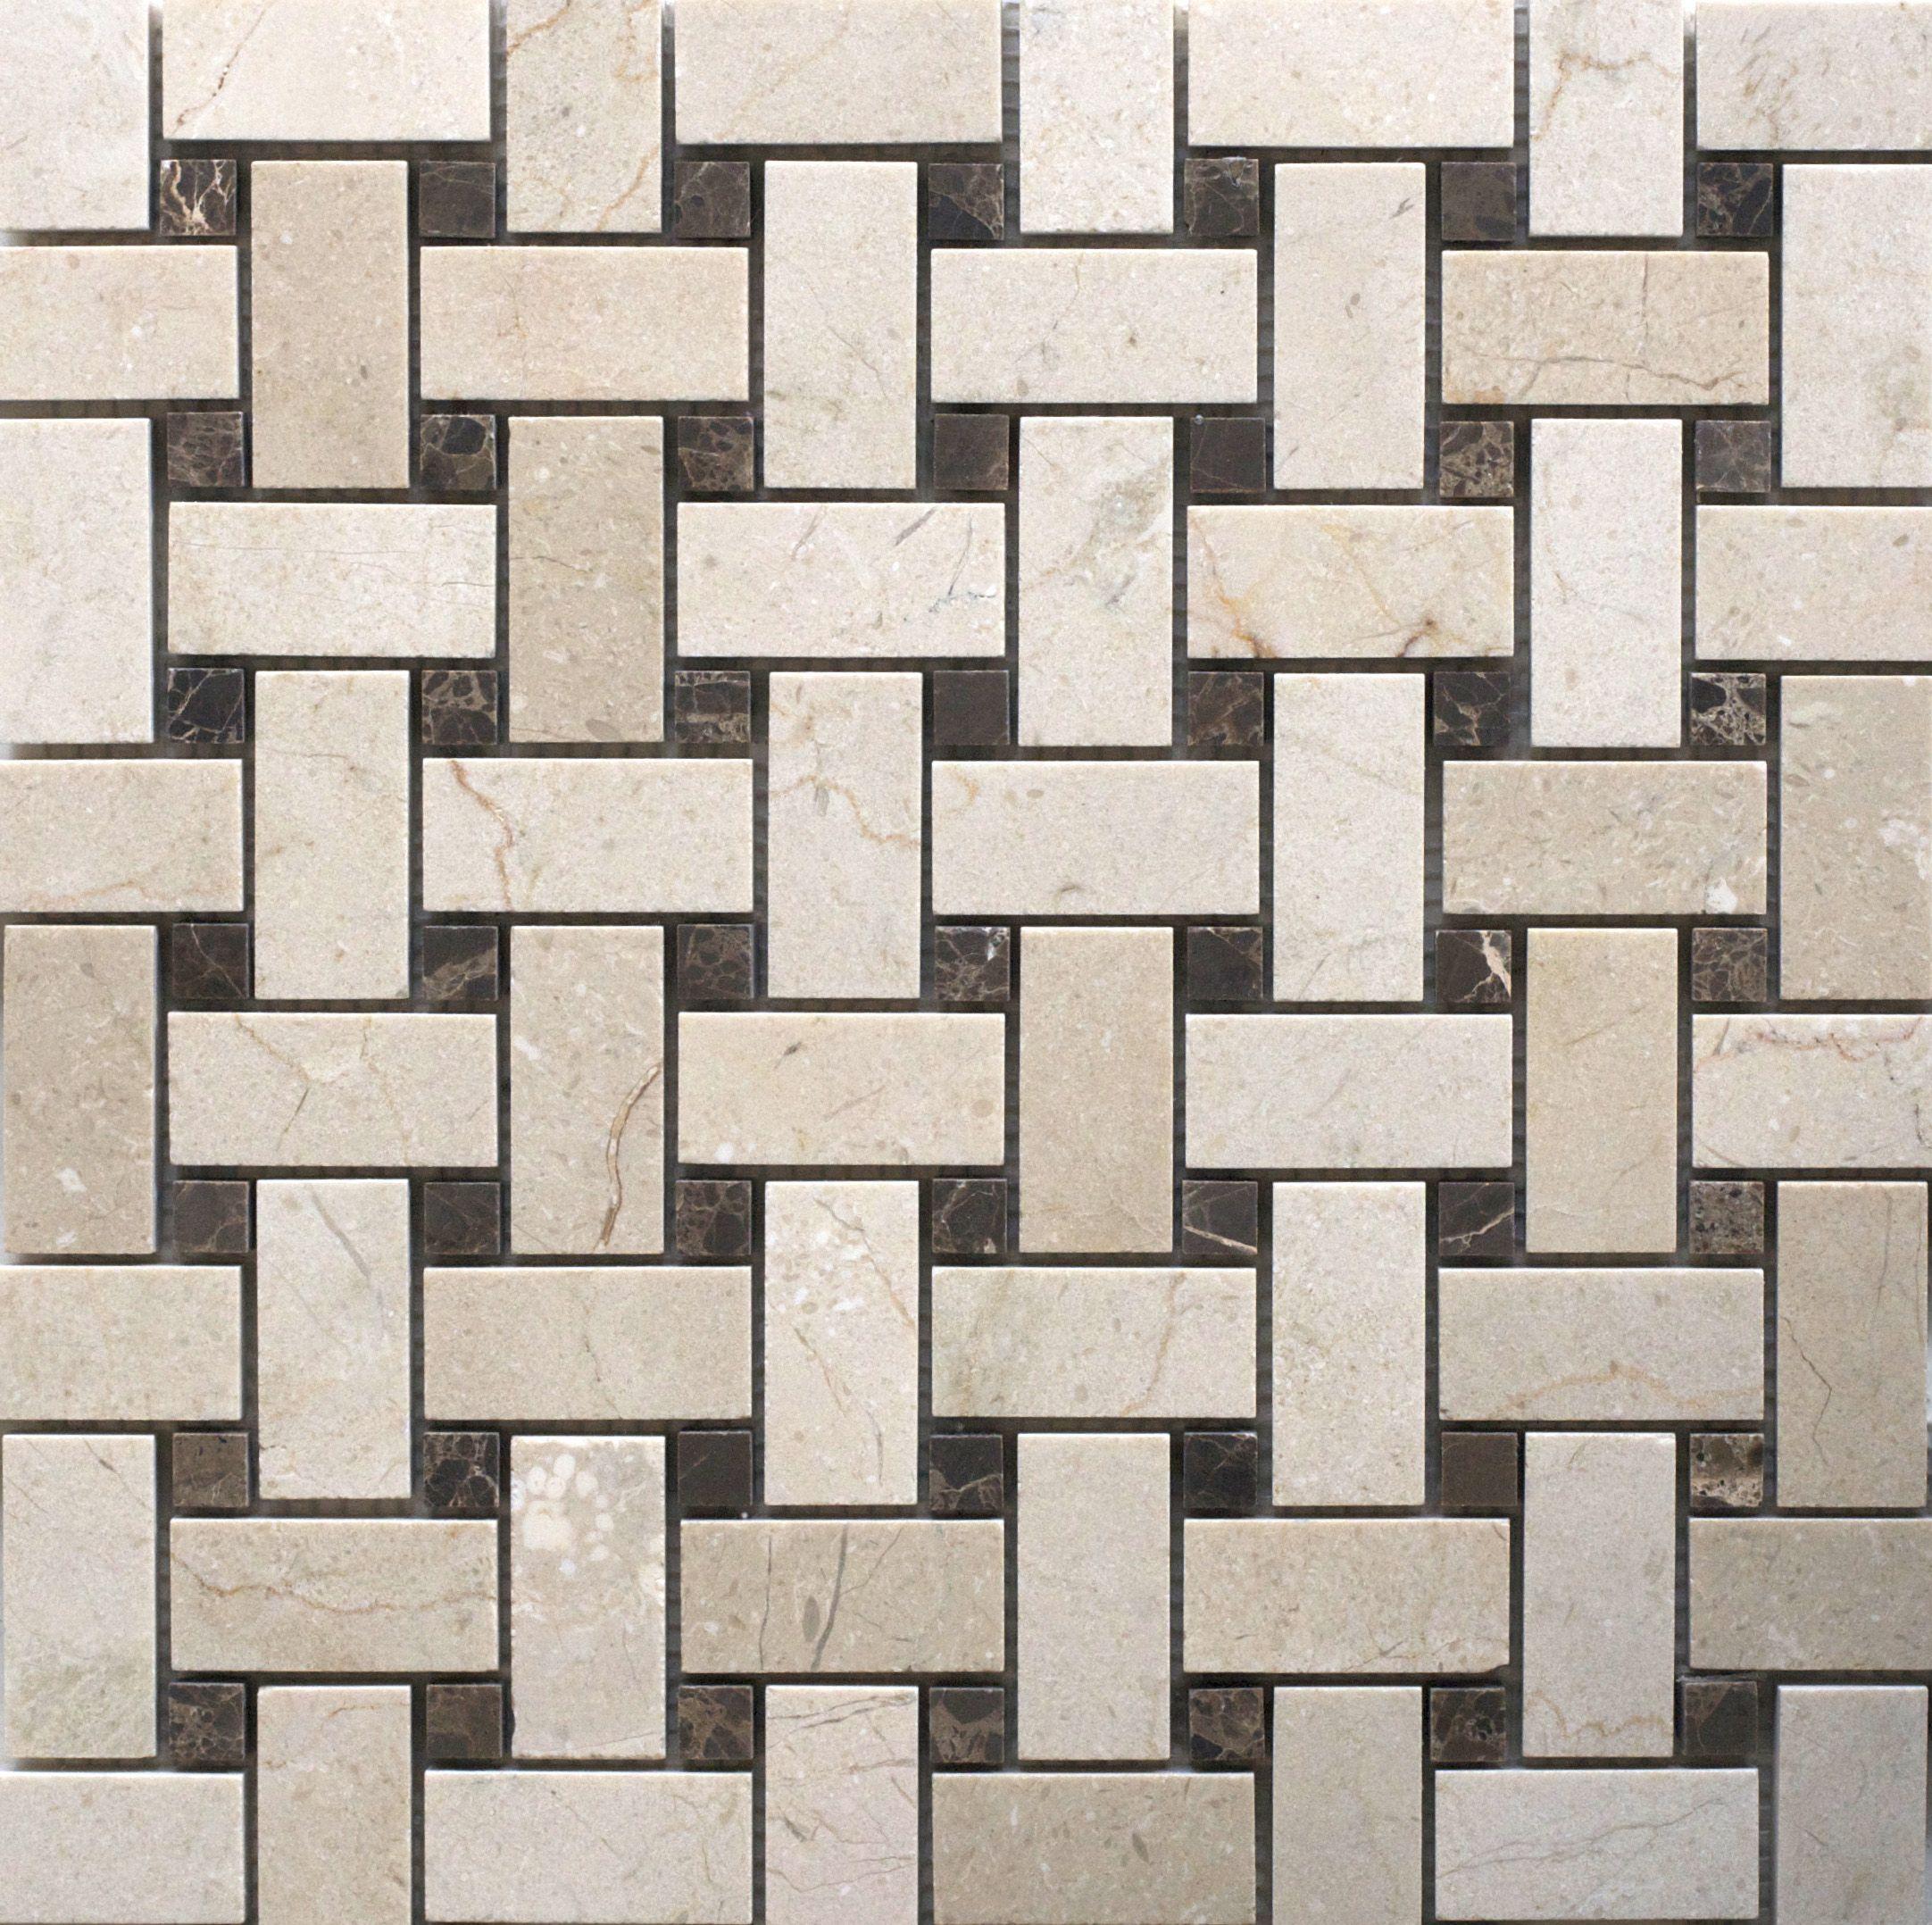 Nc222843 Marfil And Emperador Honed Marble Basketweave Basket Weave Tile Mosaic Honed Marble